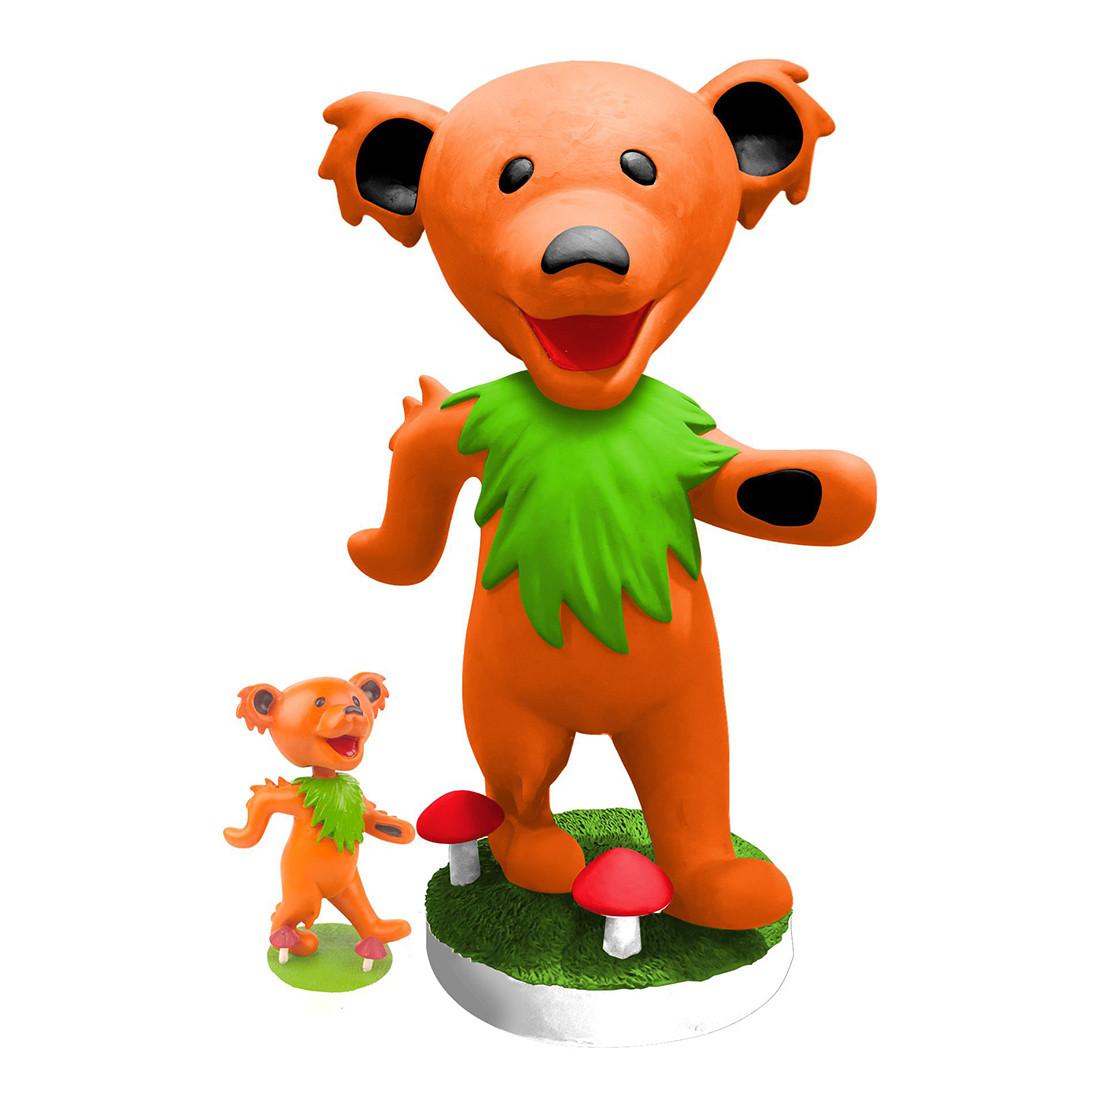 GD Bobblehead 24in Dancing Bear Orange